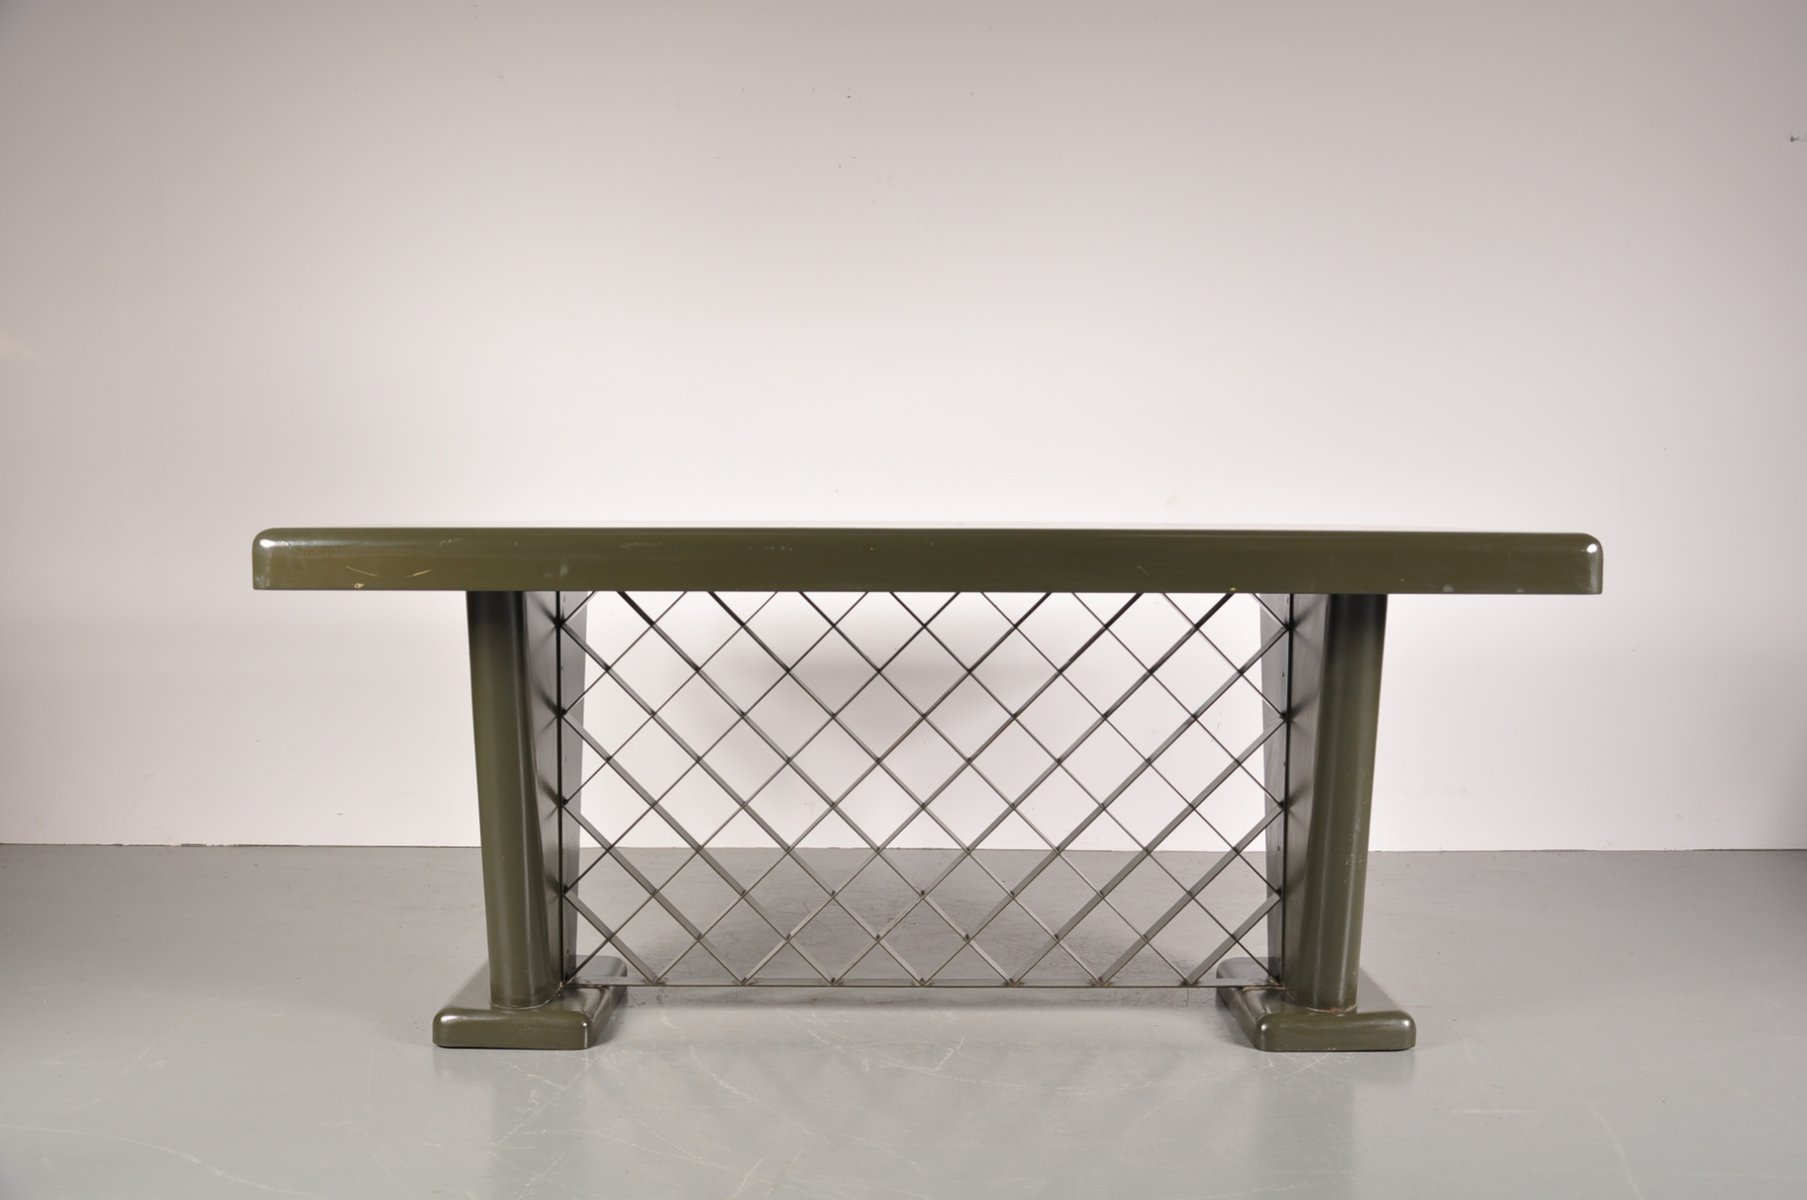 German Art Deco Metal Table 1930s